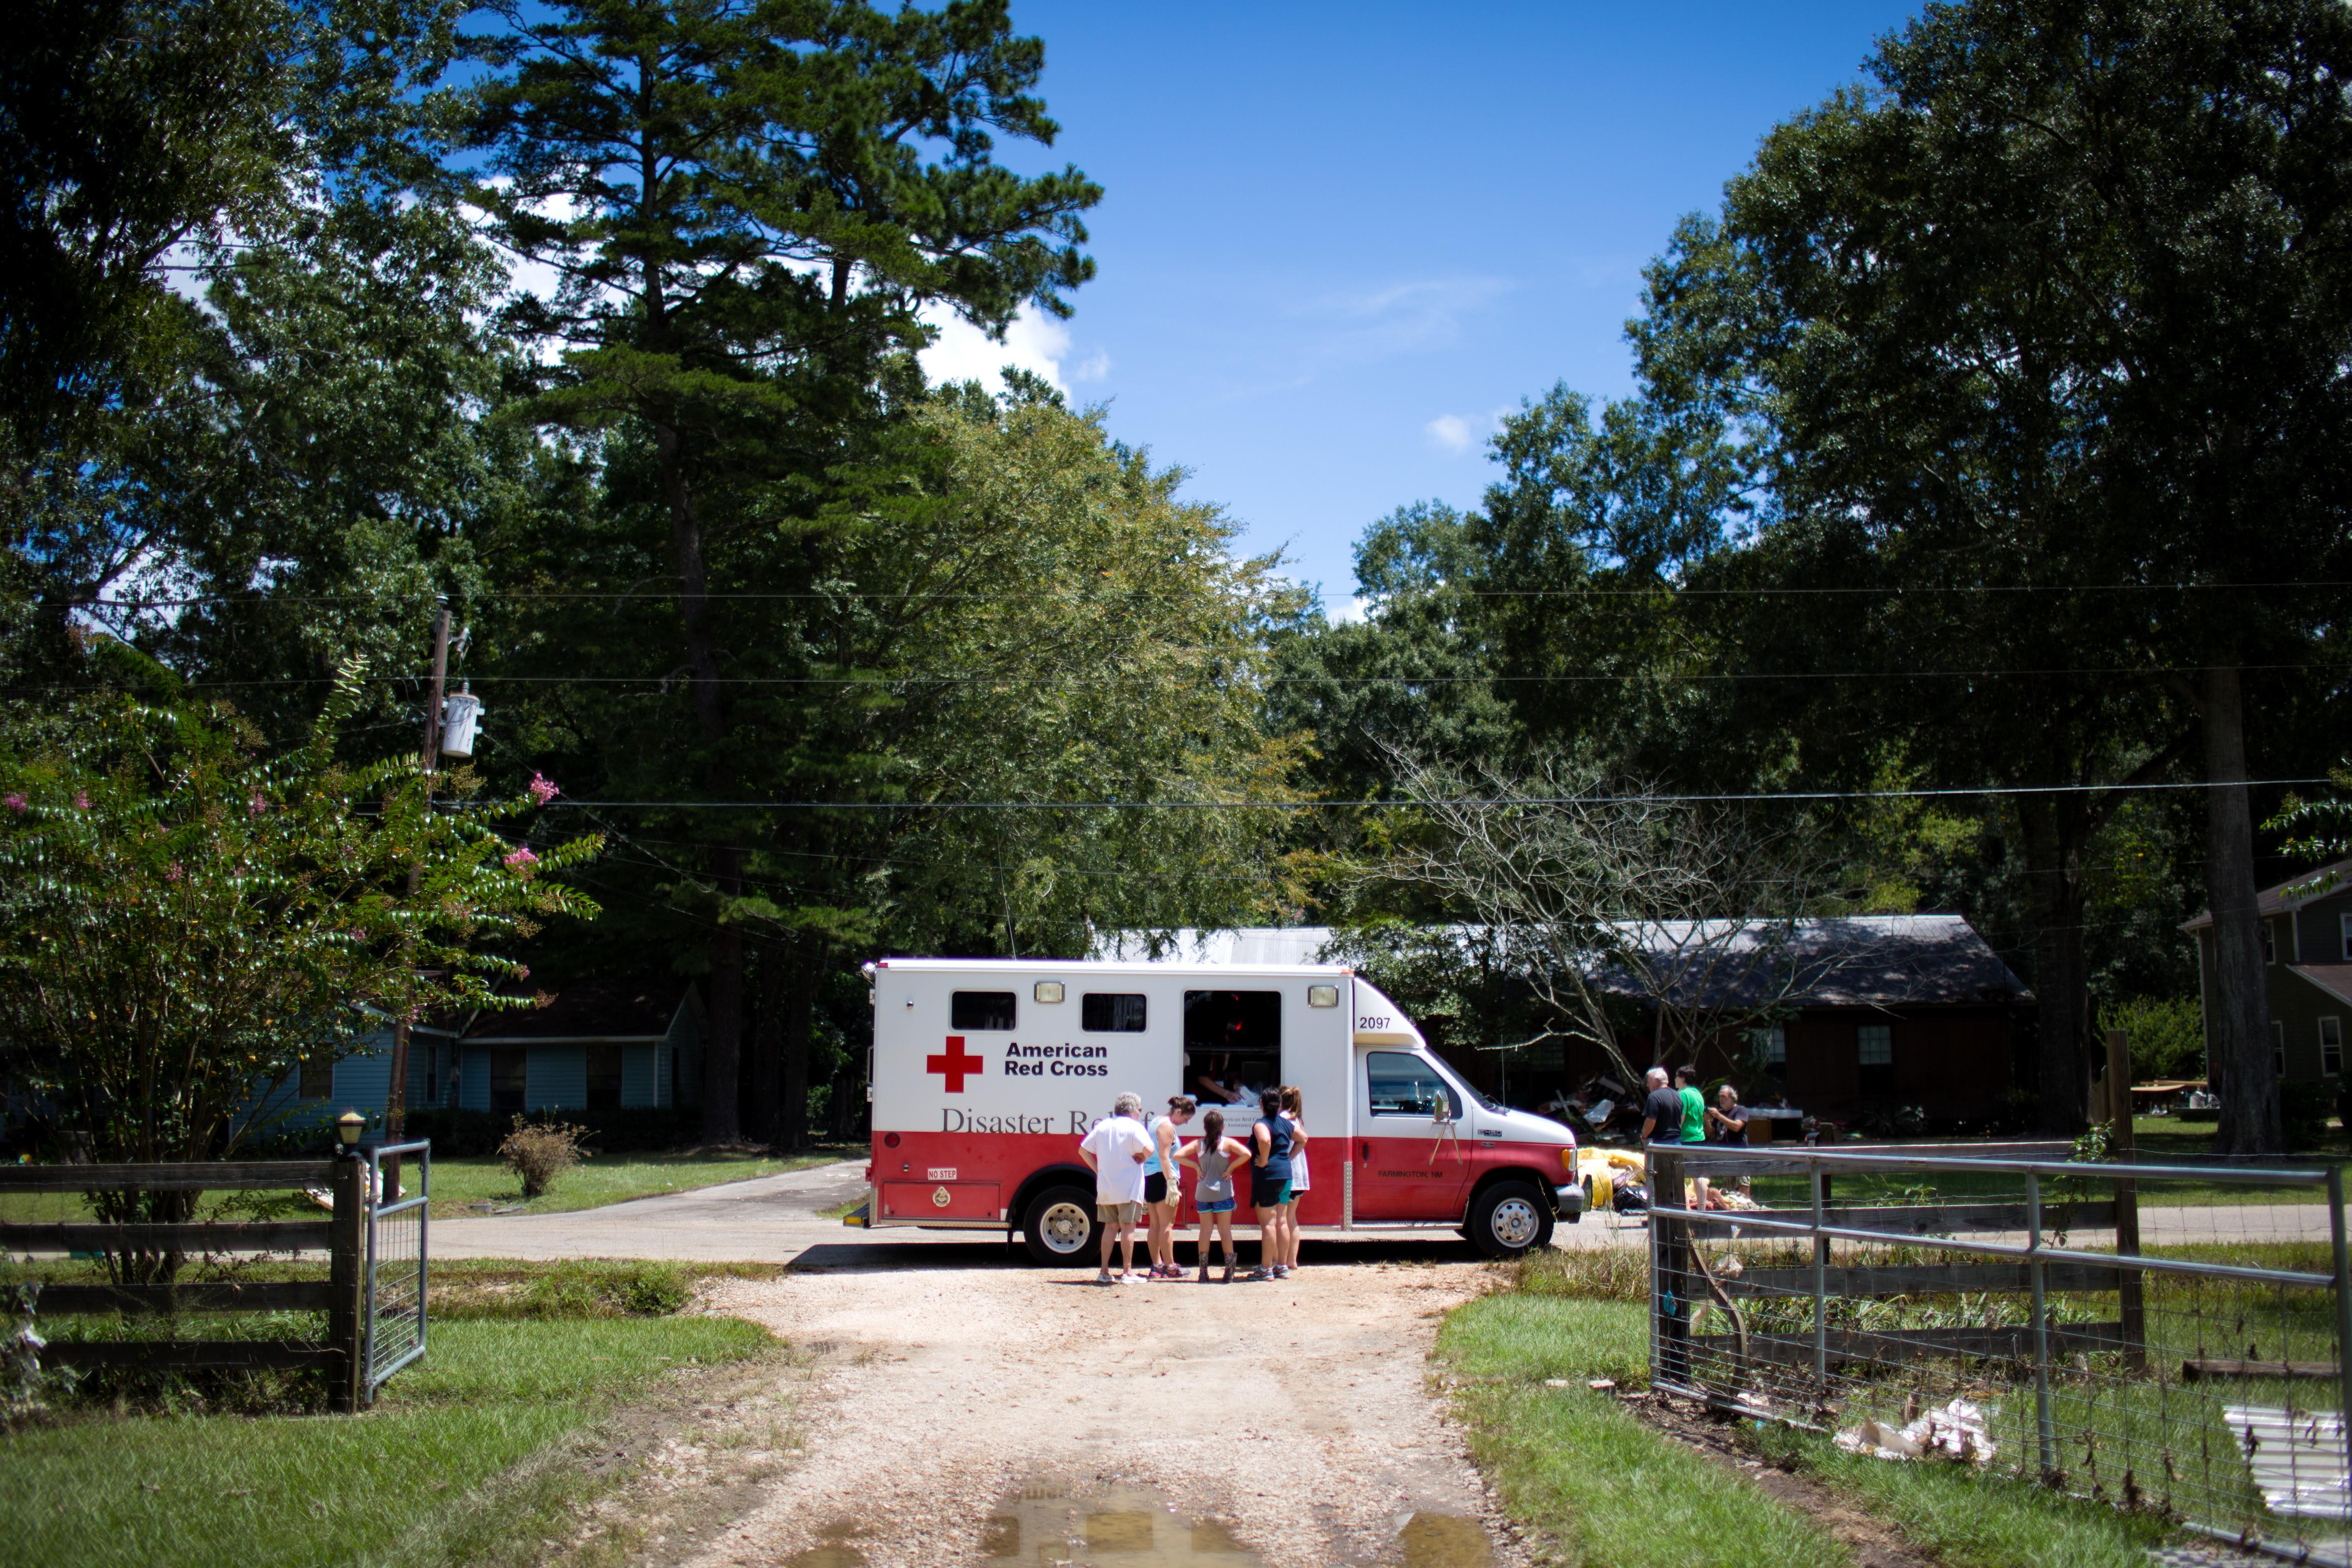 American Red Cross | LinkedIn